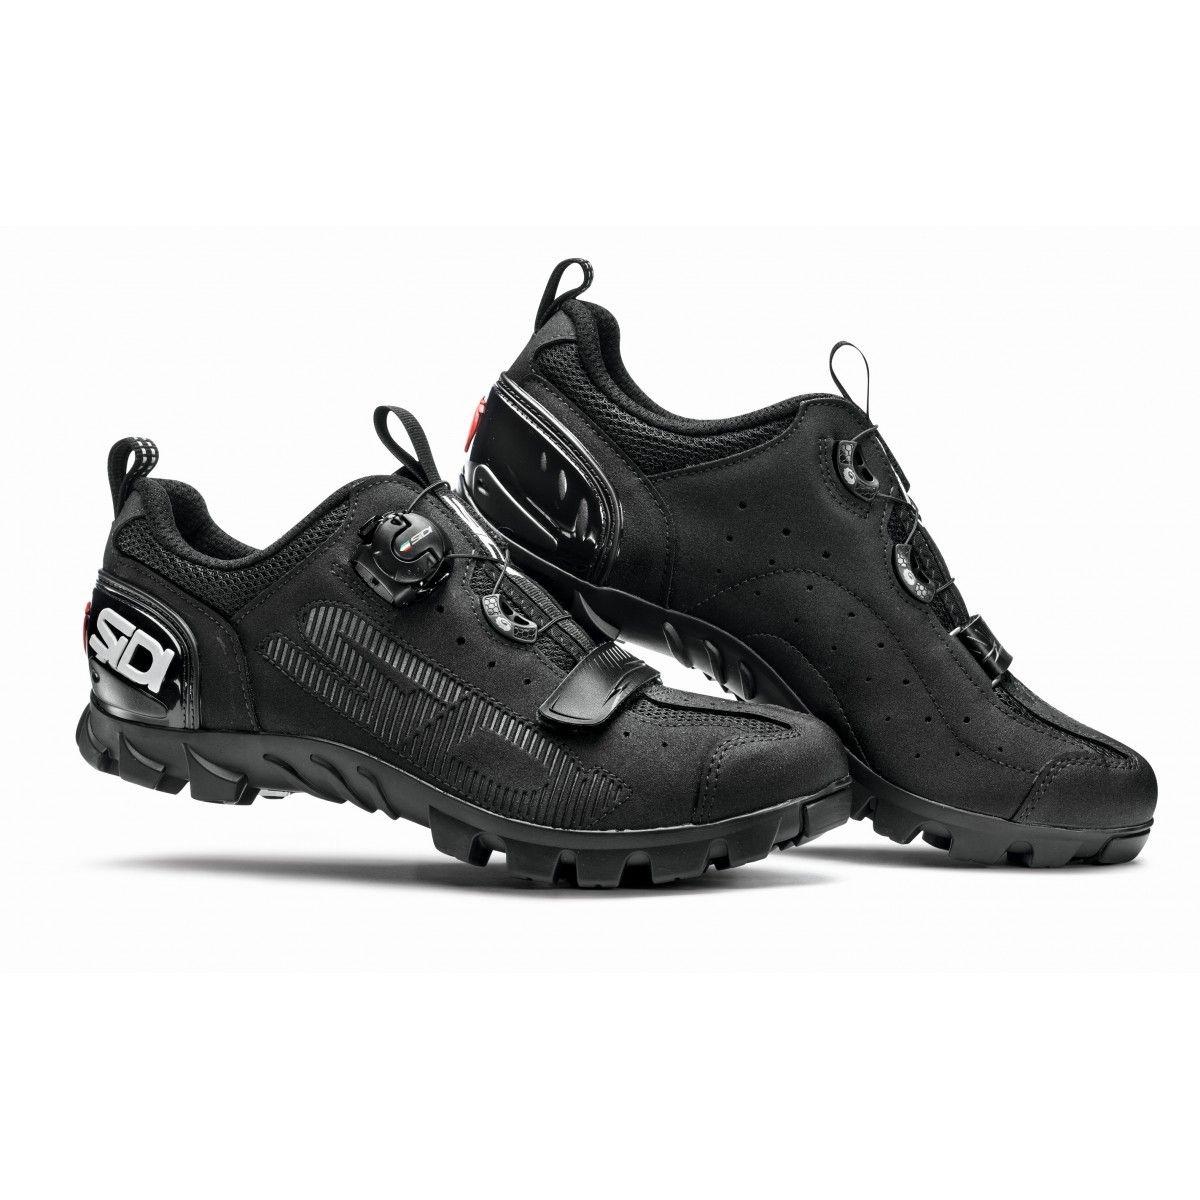 Chaussures VTT SD15 Running Trail Sidi